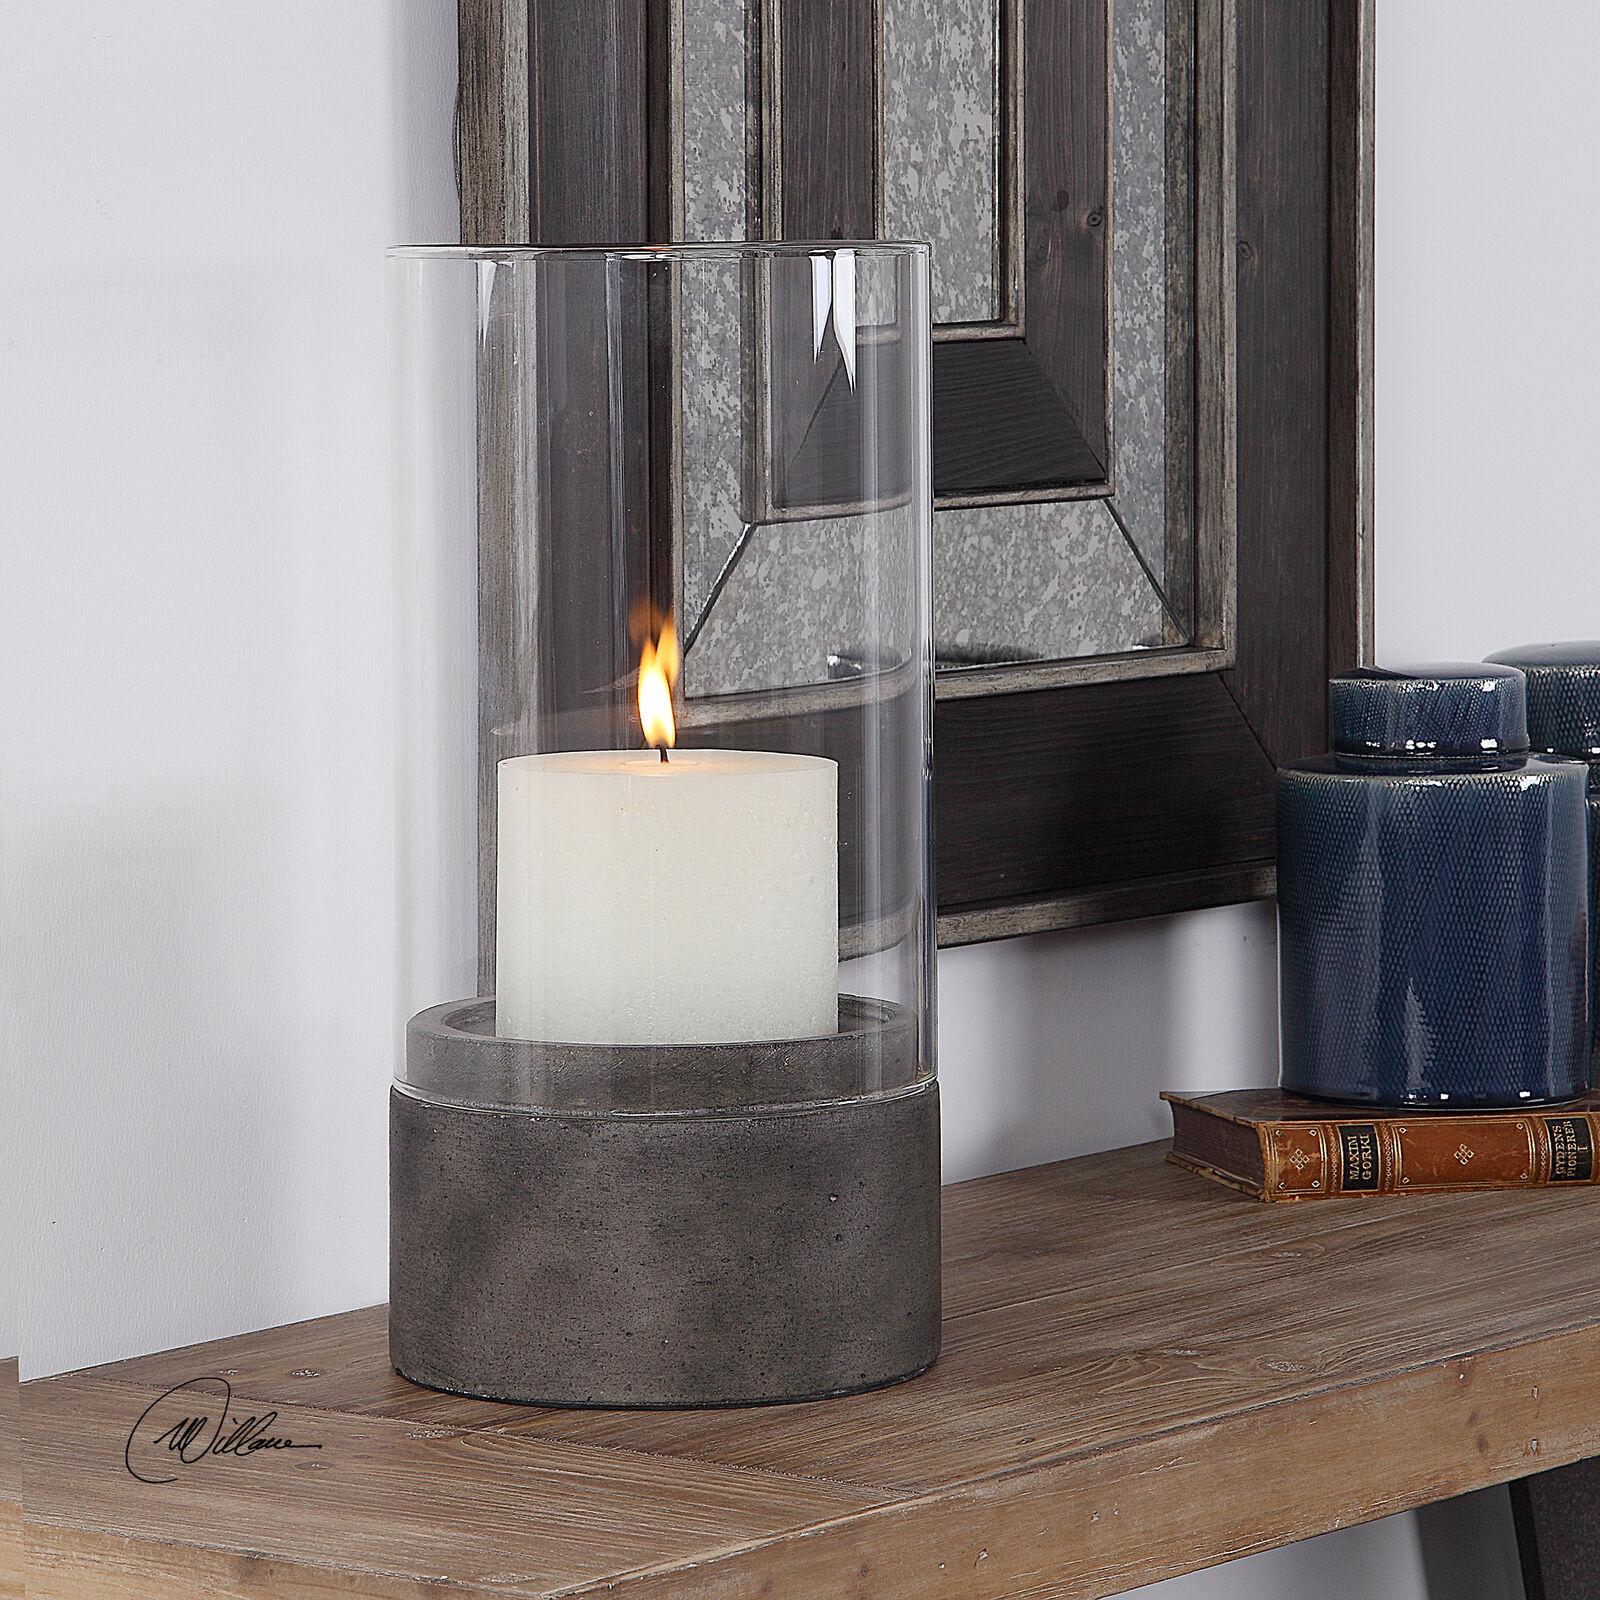 Minimalist Minimalist Minimalist Large Concrete Pillar Candle Holder   Hurricane Rustic Indoor Outdoor 56da0c